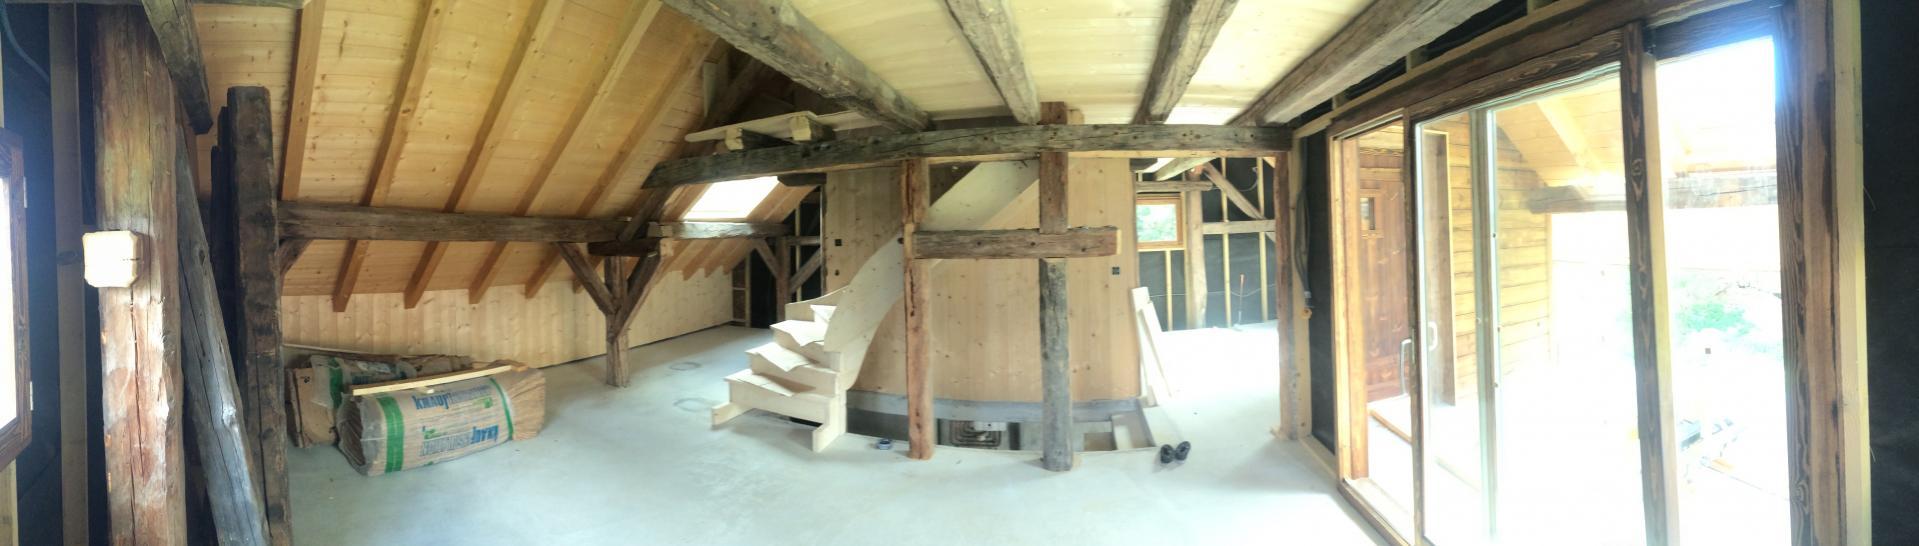 escalier rustique en sapin. Black Bedroom Furniture Sets. Home Design Ideas